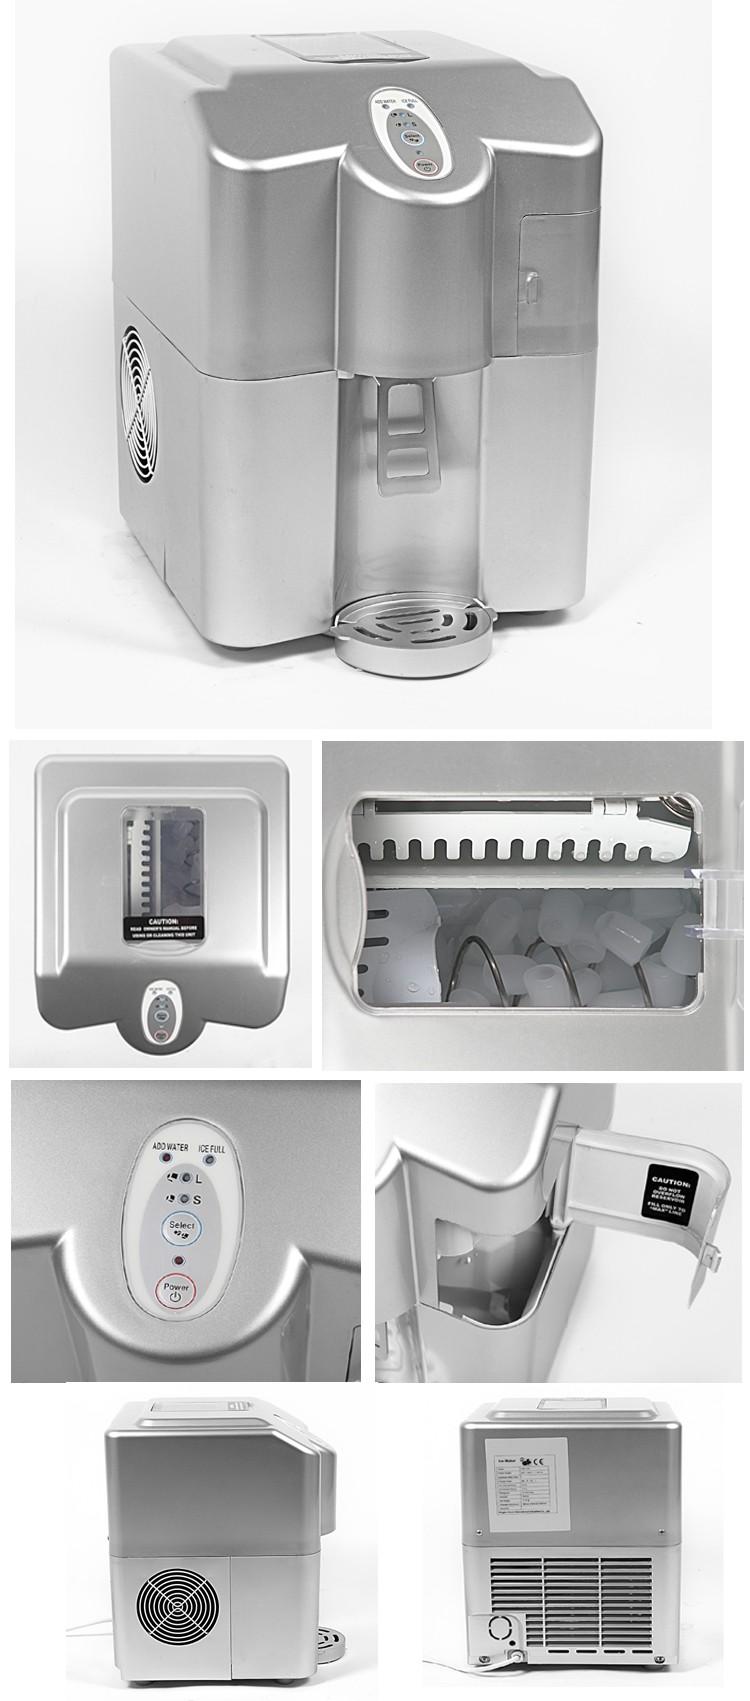 Domestic Countertop Ice Maker : Countertop Ice Cube Maker Machine Home Mini Ice Cube Maker - Buy Ice ...